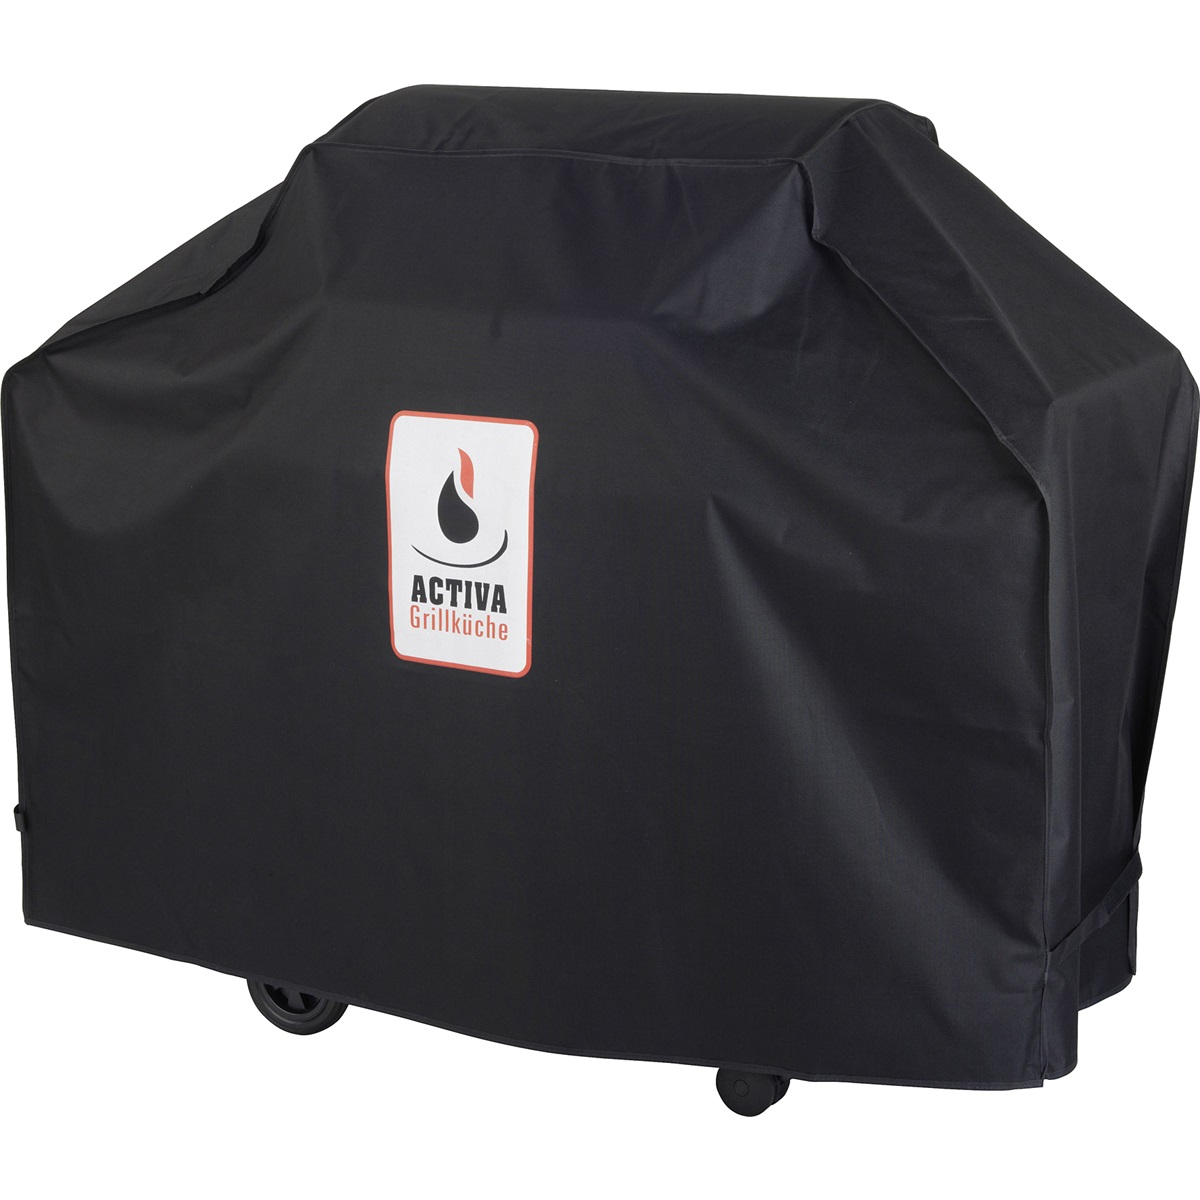 Activa ochranný obal na gril Premium M